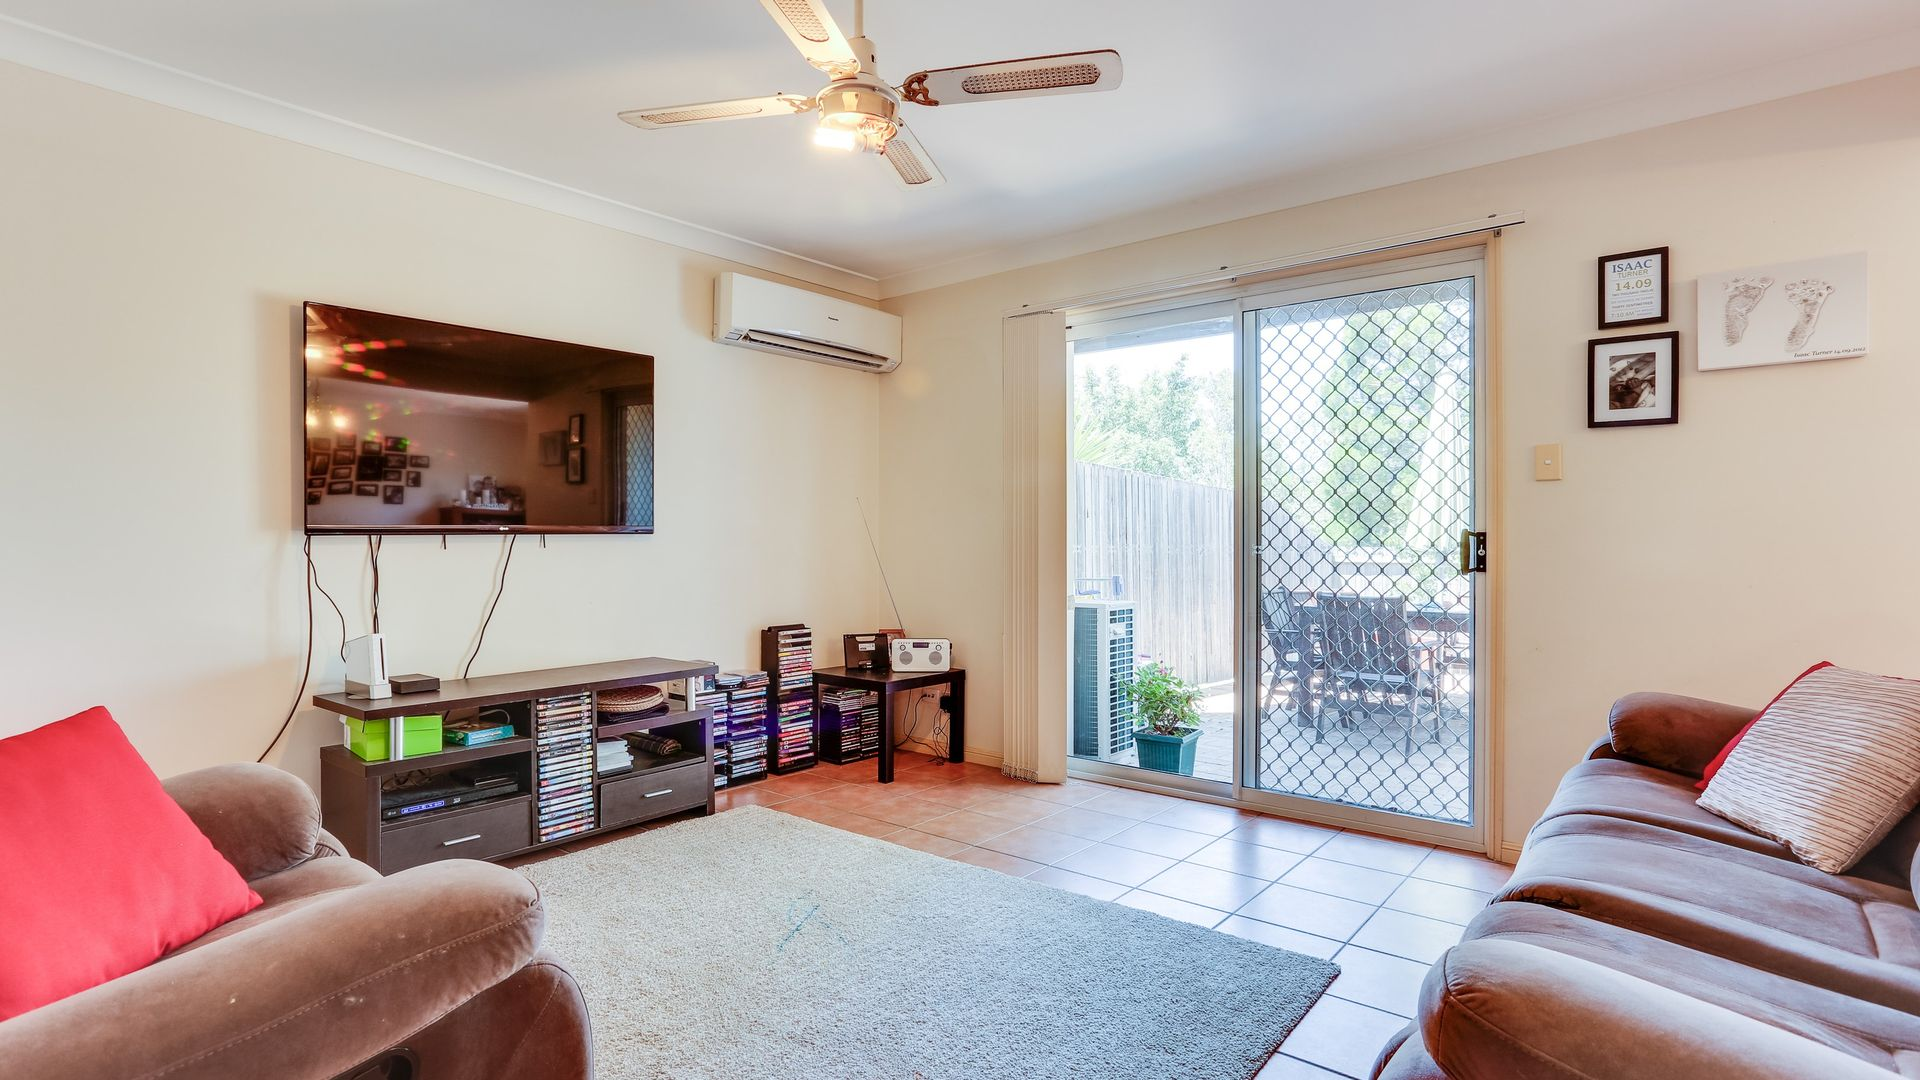 22/580 Seventeen Mile Rocks Rd, Sinnamon Park QLD 4073, Image 1